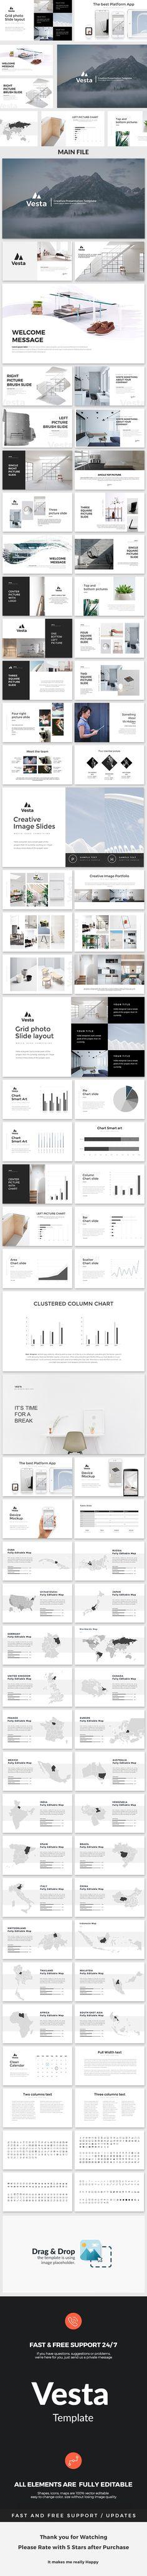 Vesta Creative Powerpoint Template. Download here: https://graphicriver.net/item/vesta-creative-powerpoint-template/17518424?ref=ksioks